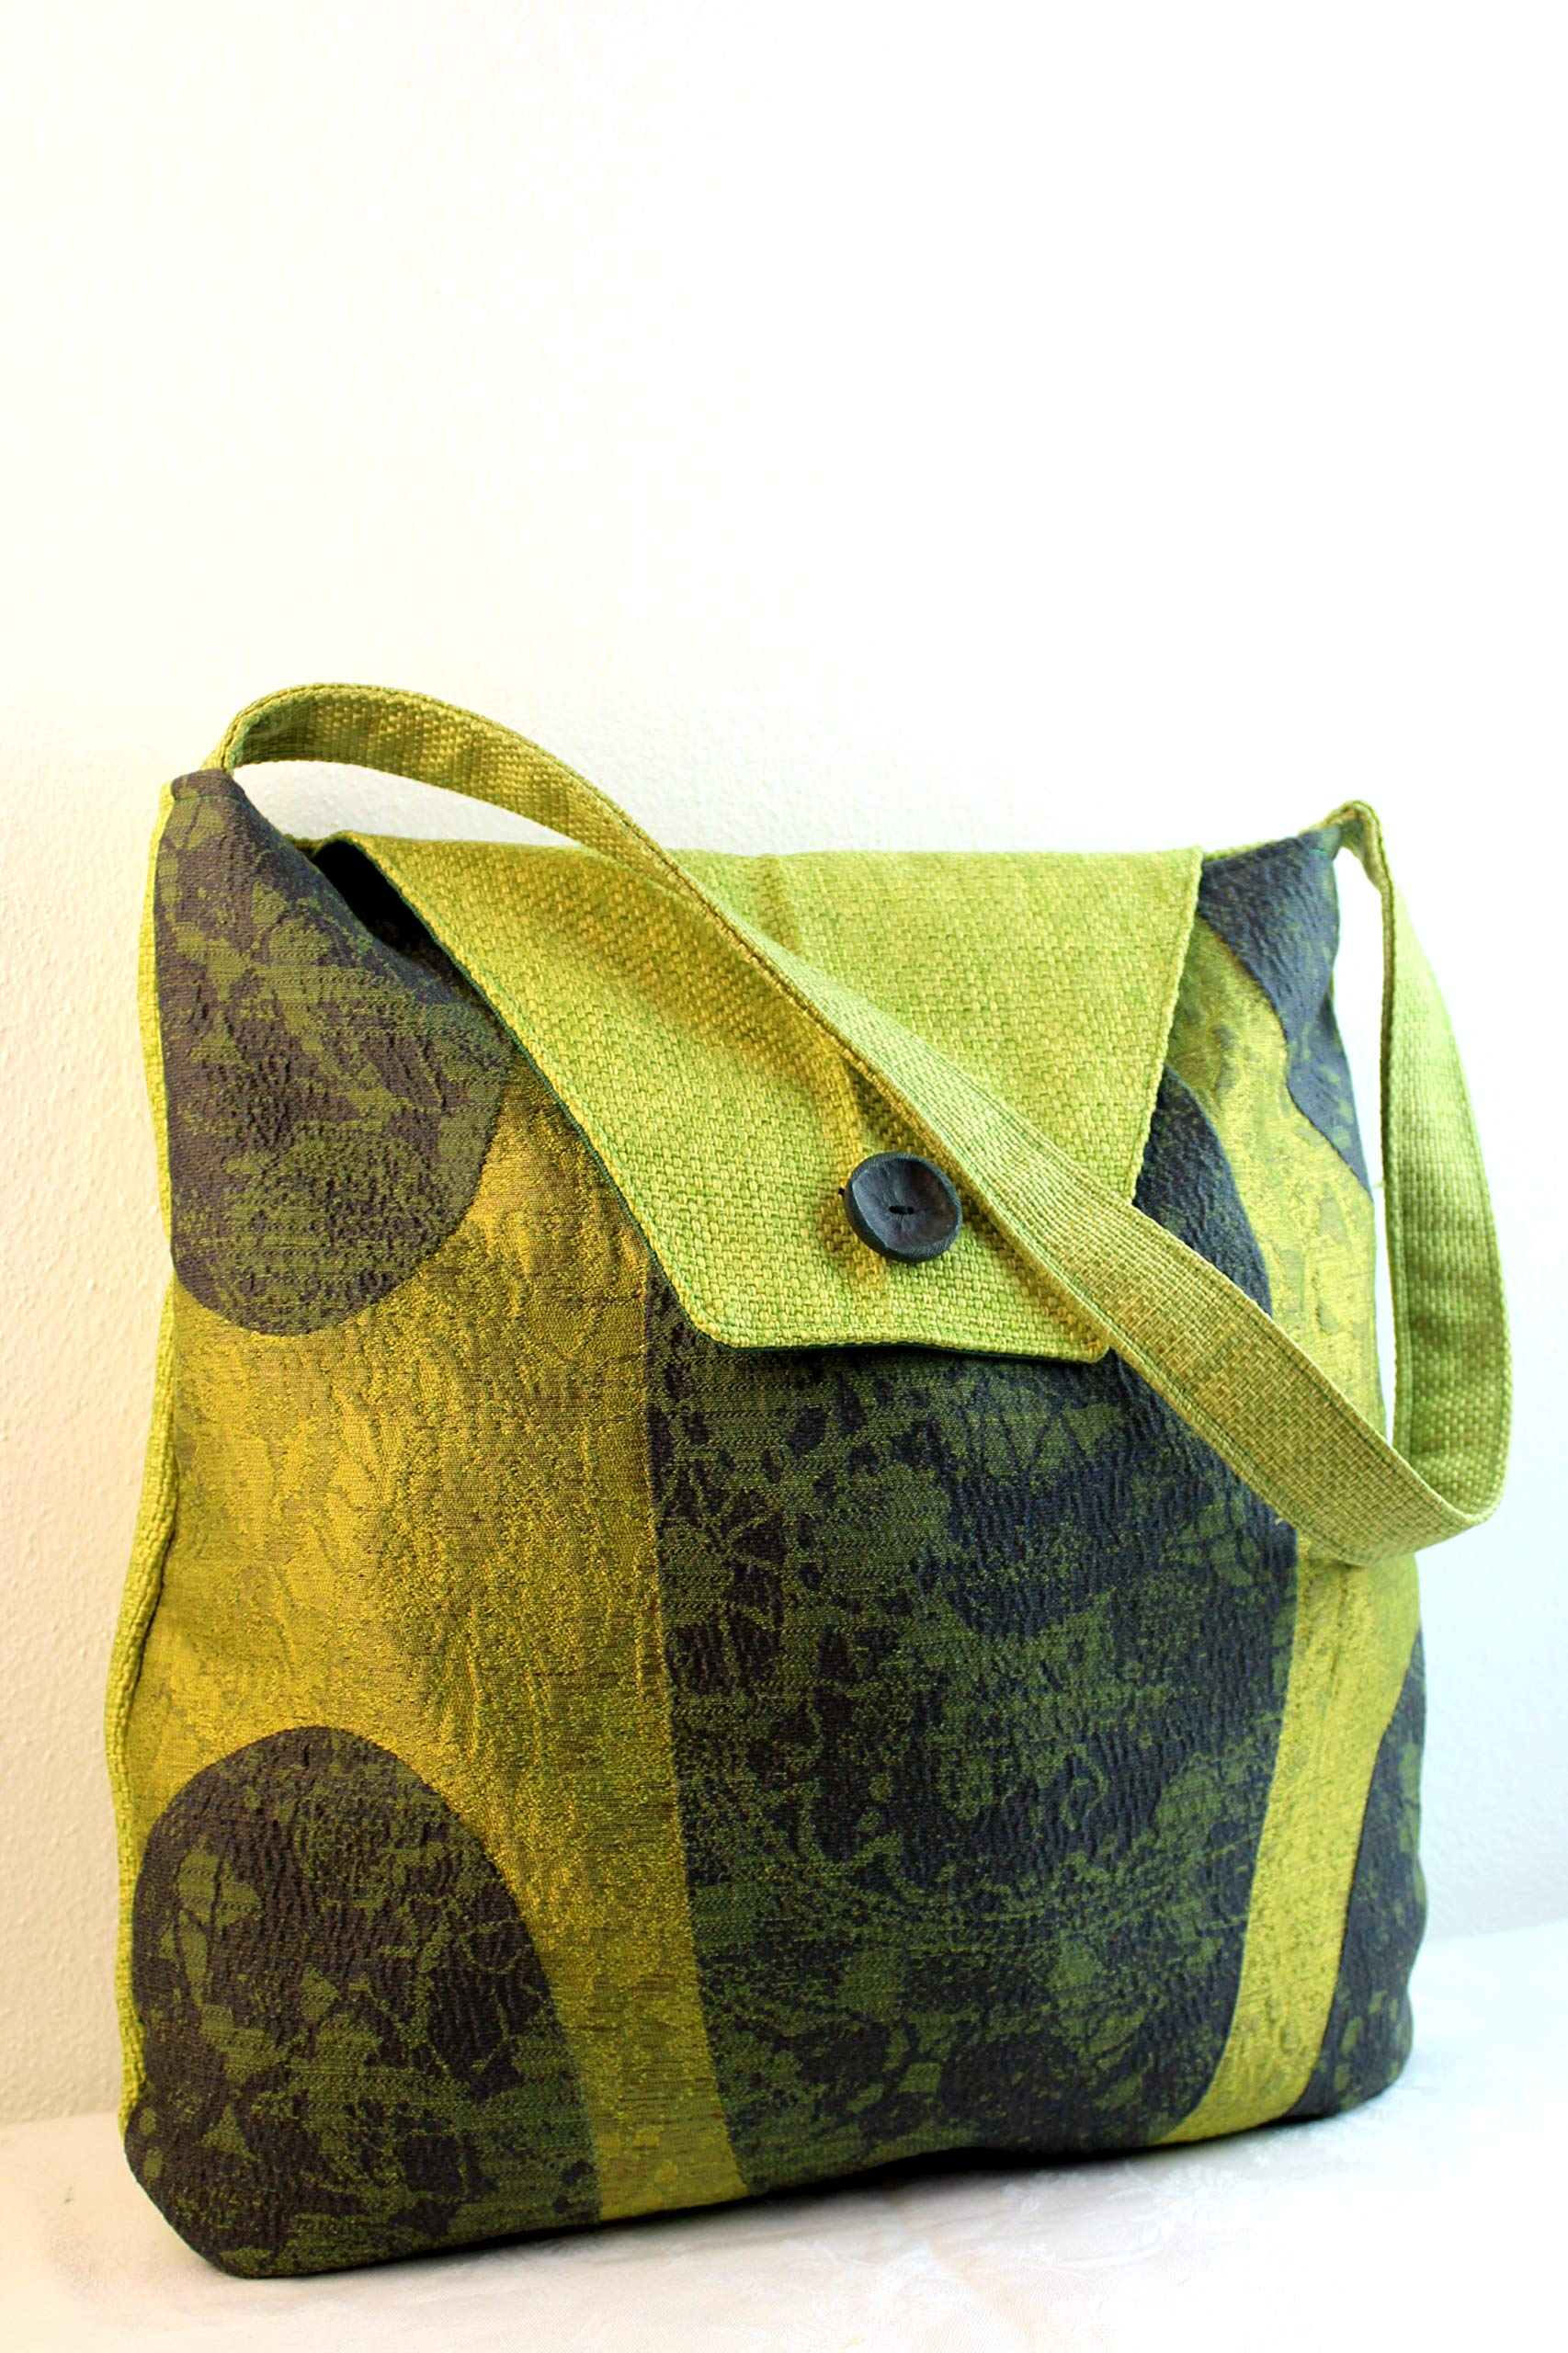 Shoulder bag in damask fabric - Green tapestry - made in italy sartorial bag - handmade-bags